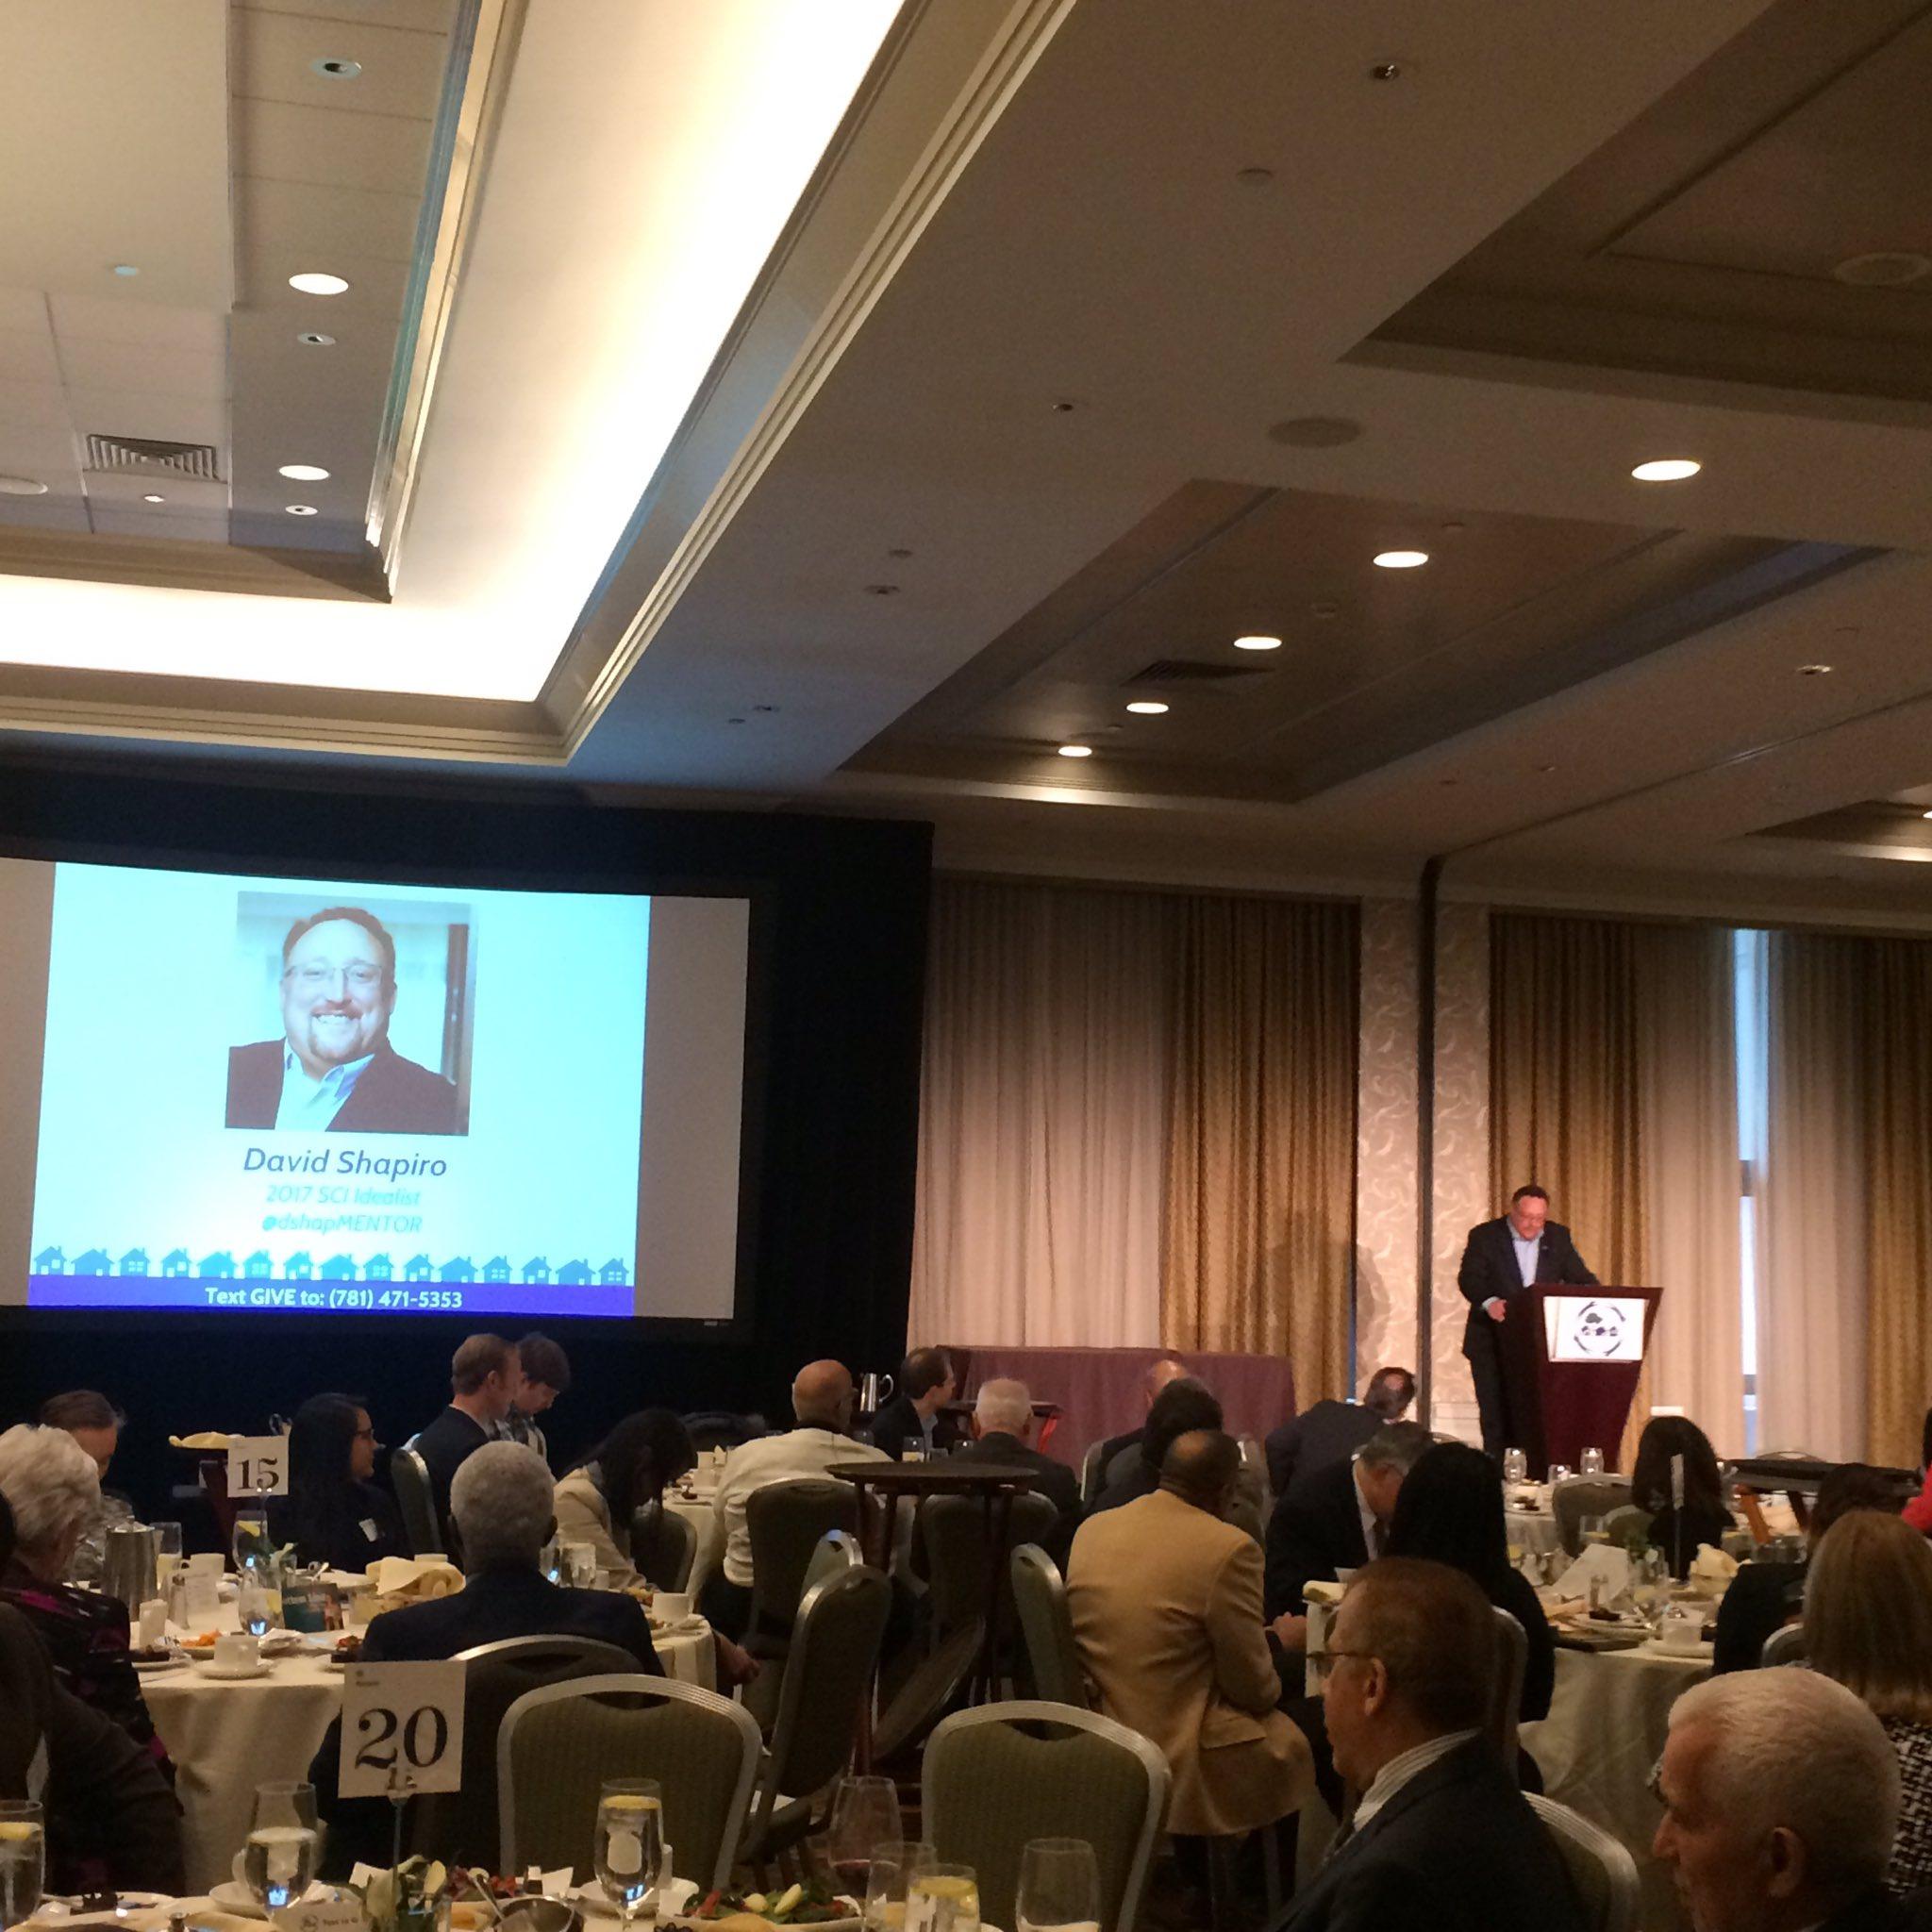 SCI is proud to honor David Shapiro, CEO of MENTOR, with the 2017 SCI Idealist award @dshapMENTOR @MENTORnational #SCImpact https://t.co/B2ZCWwjo4f